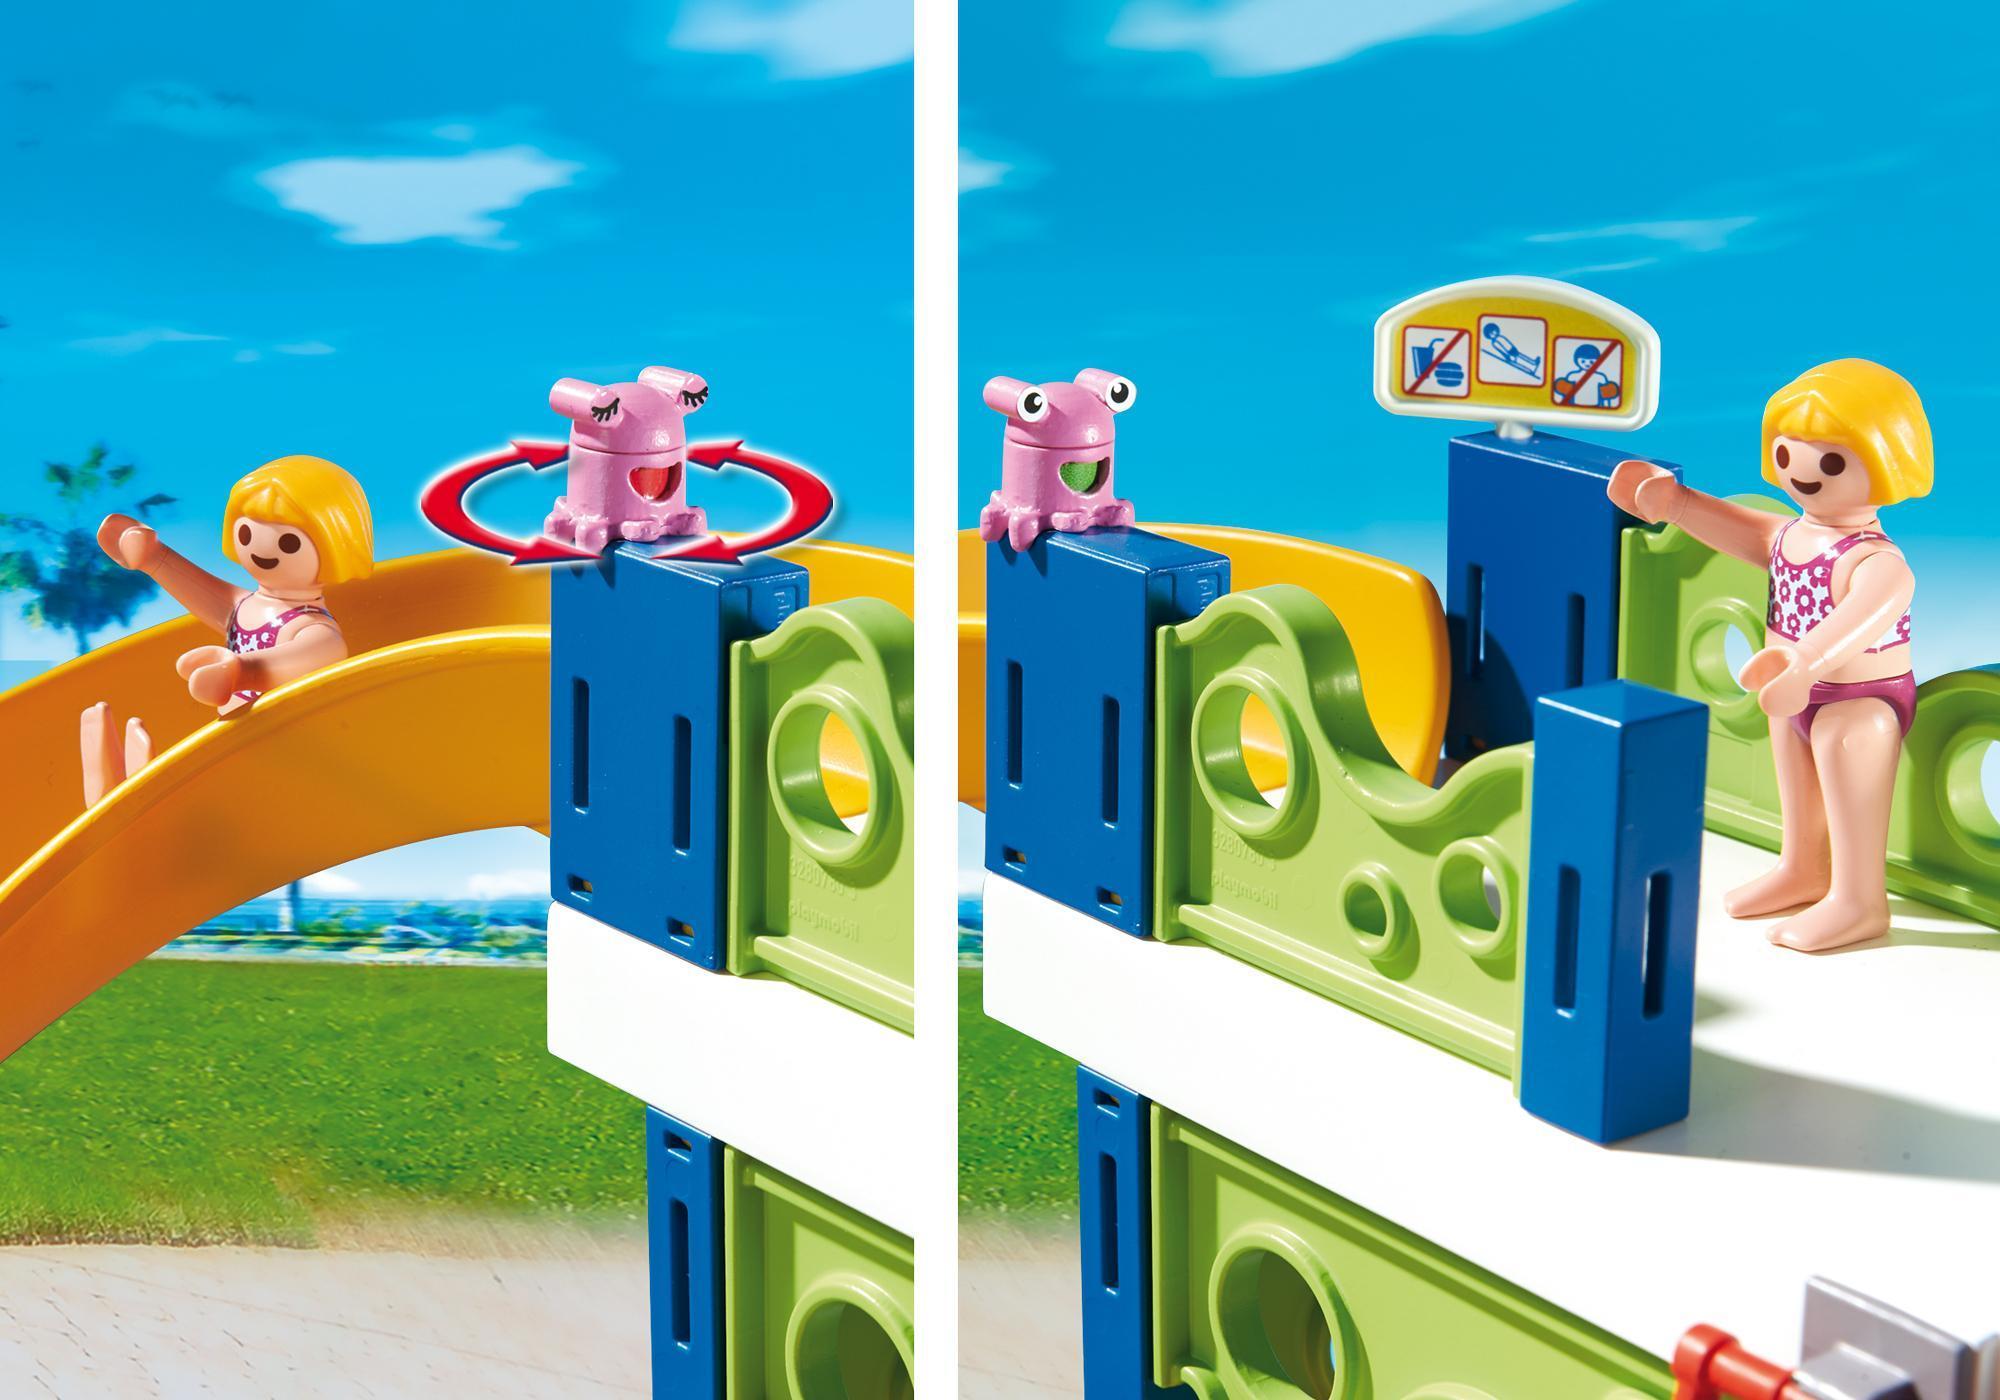 http://media.playmobil.com/i/playmobil/6669_product_extra3/Aqua park με νεροτσουλήθρες